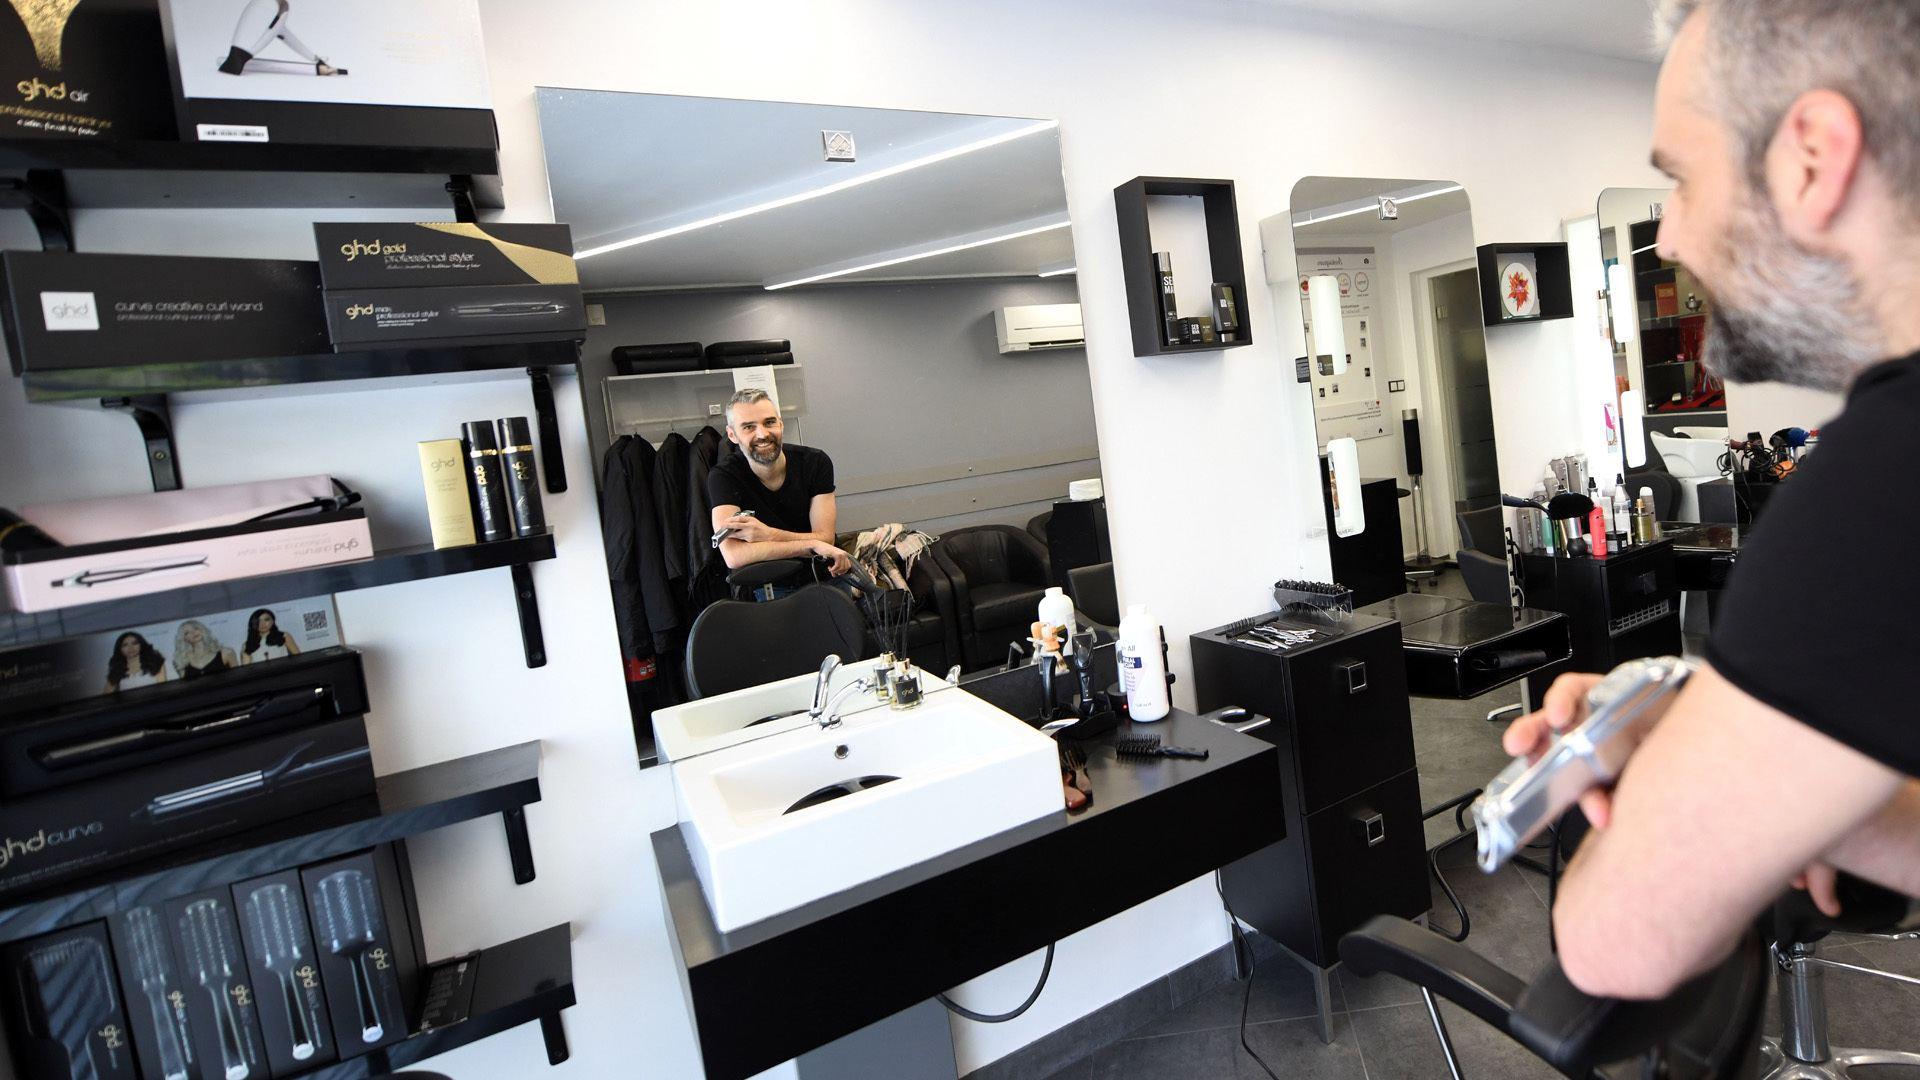 A Bollwiller un coiffeur créatif et connecté : Maxime Muller patron de Maxim'um coiffure